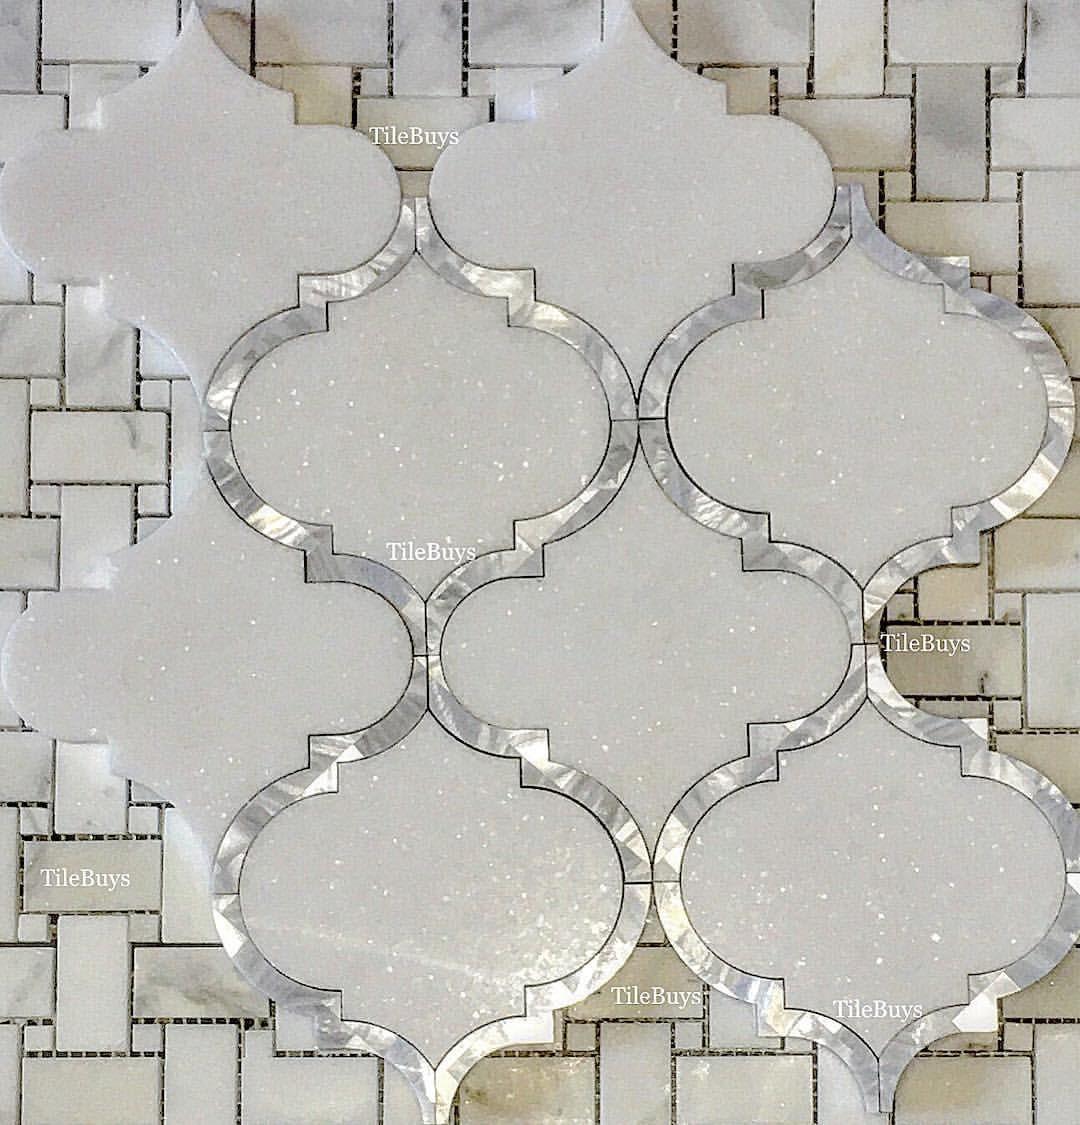 Pin By Tilebuys On Luxury Interior Design Waterjet Tile